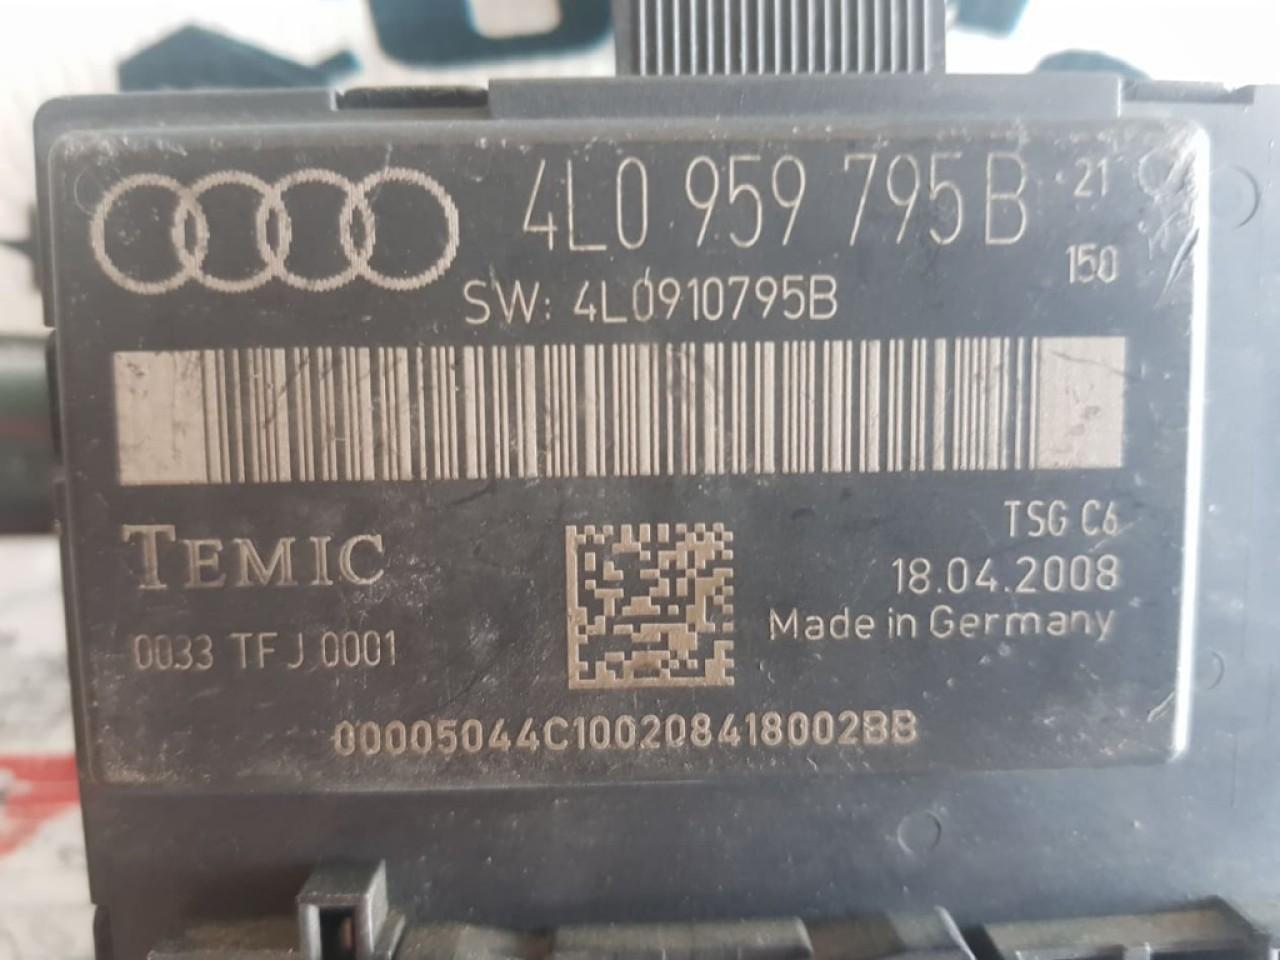 Modul usa stanga spate Audi Q7 4l0959795b